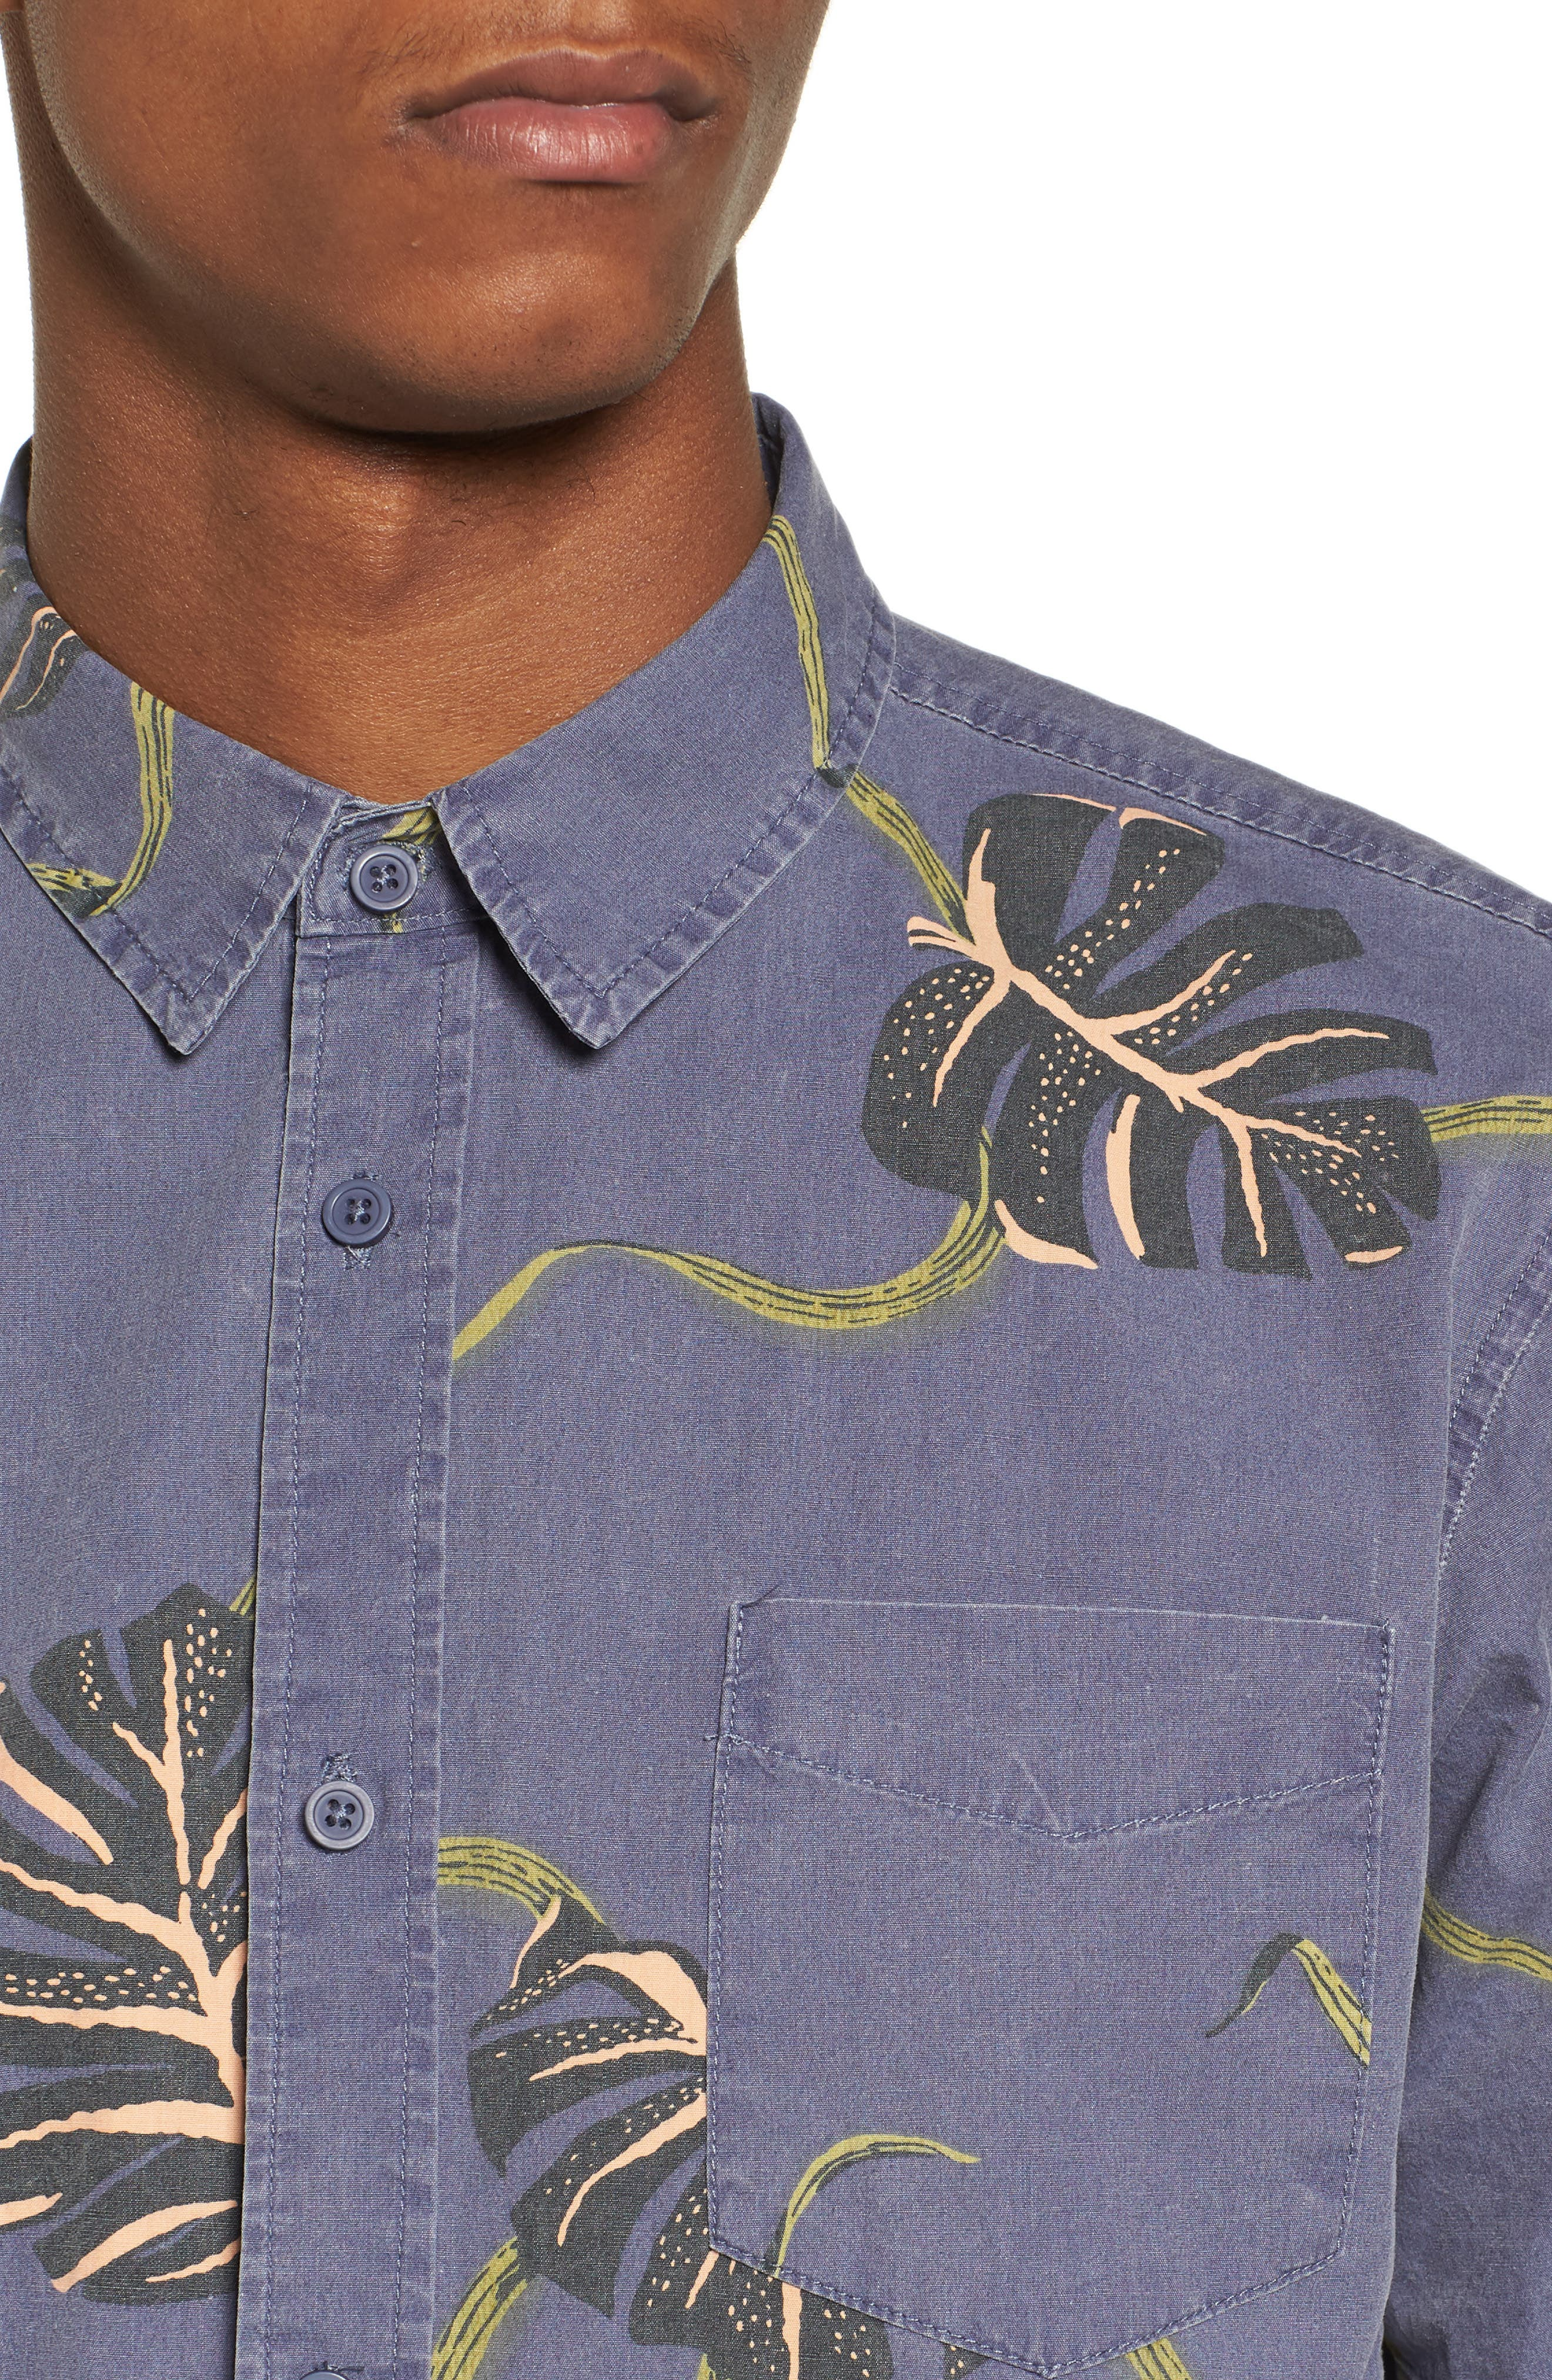 Pointer Woven Shirt,                             Alternate thumbnail 4, color,                             401